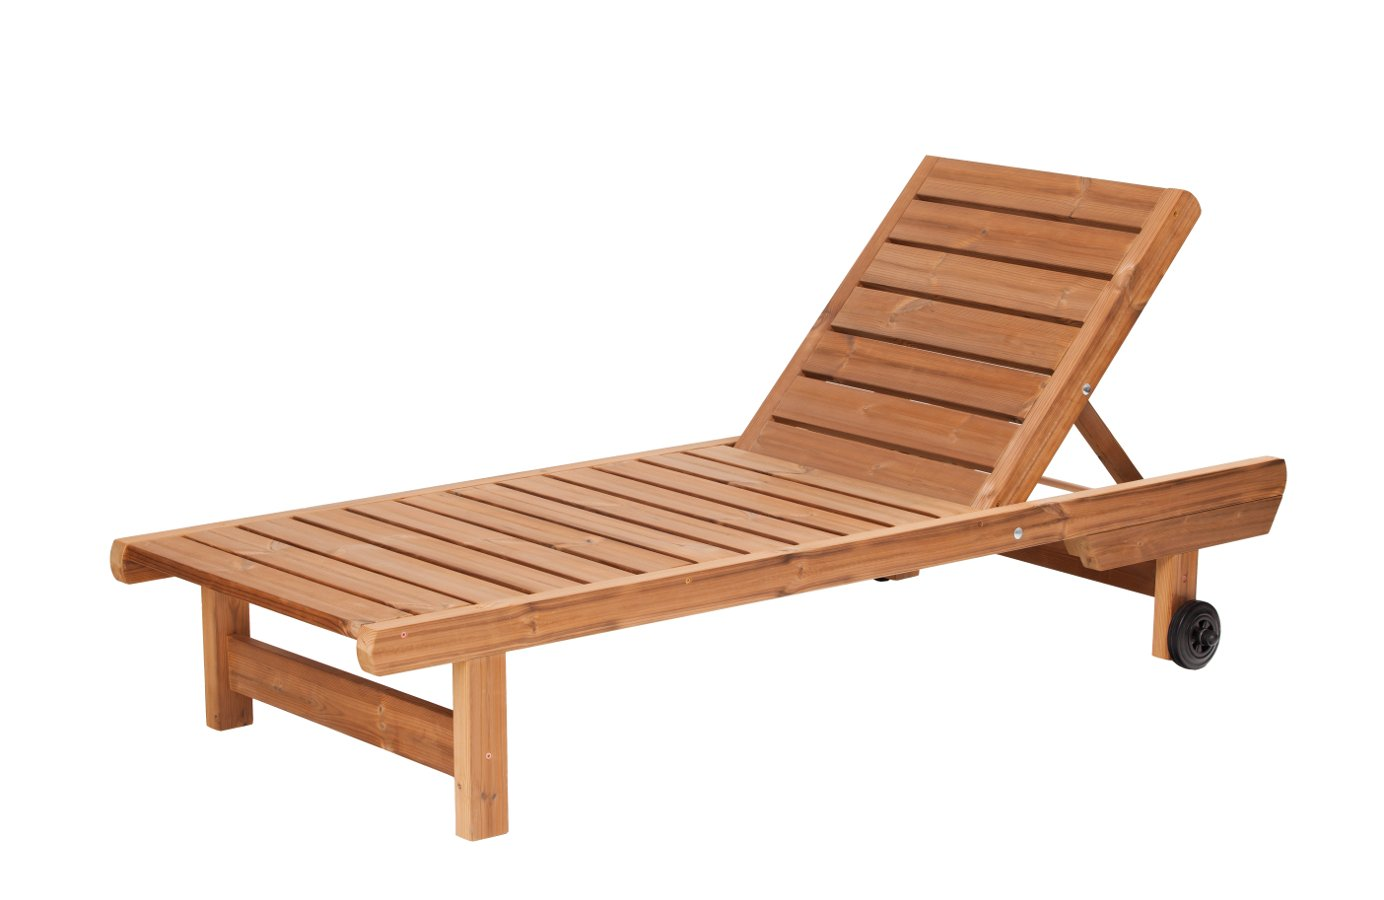 Gartenmöbel PROWOOD aus Massivholz THERMOWOOD – Liegestuhl LE1 200 online bestellen